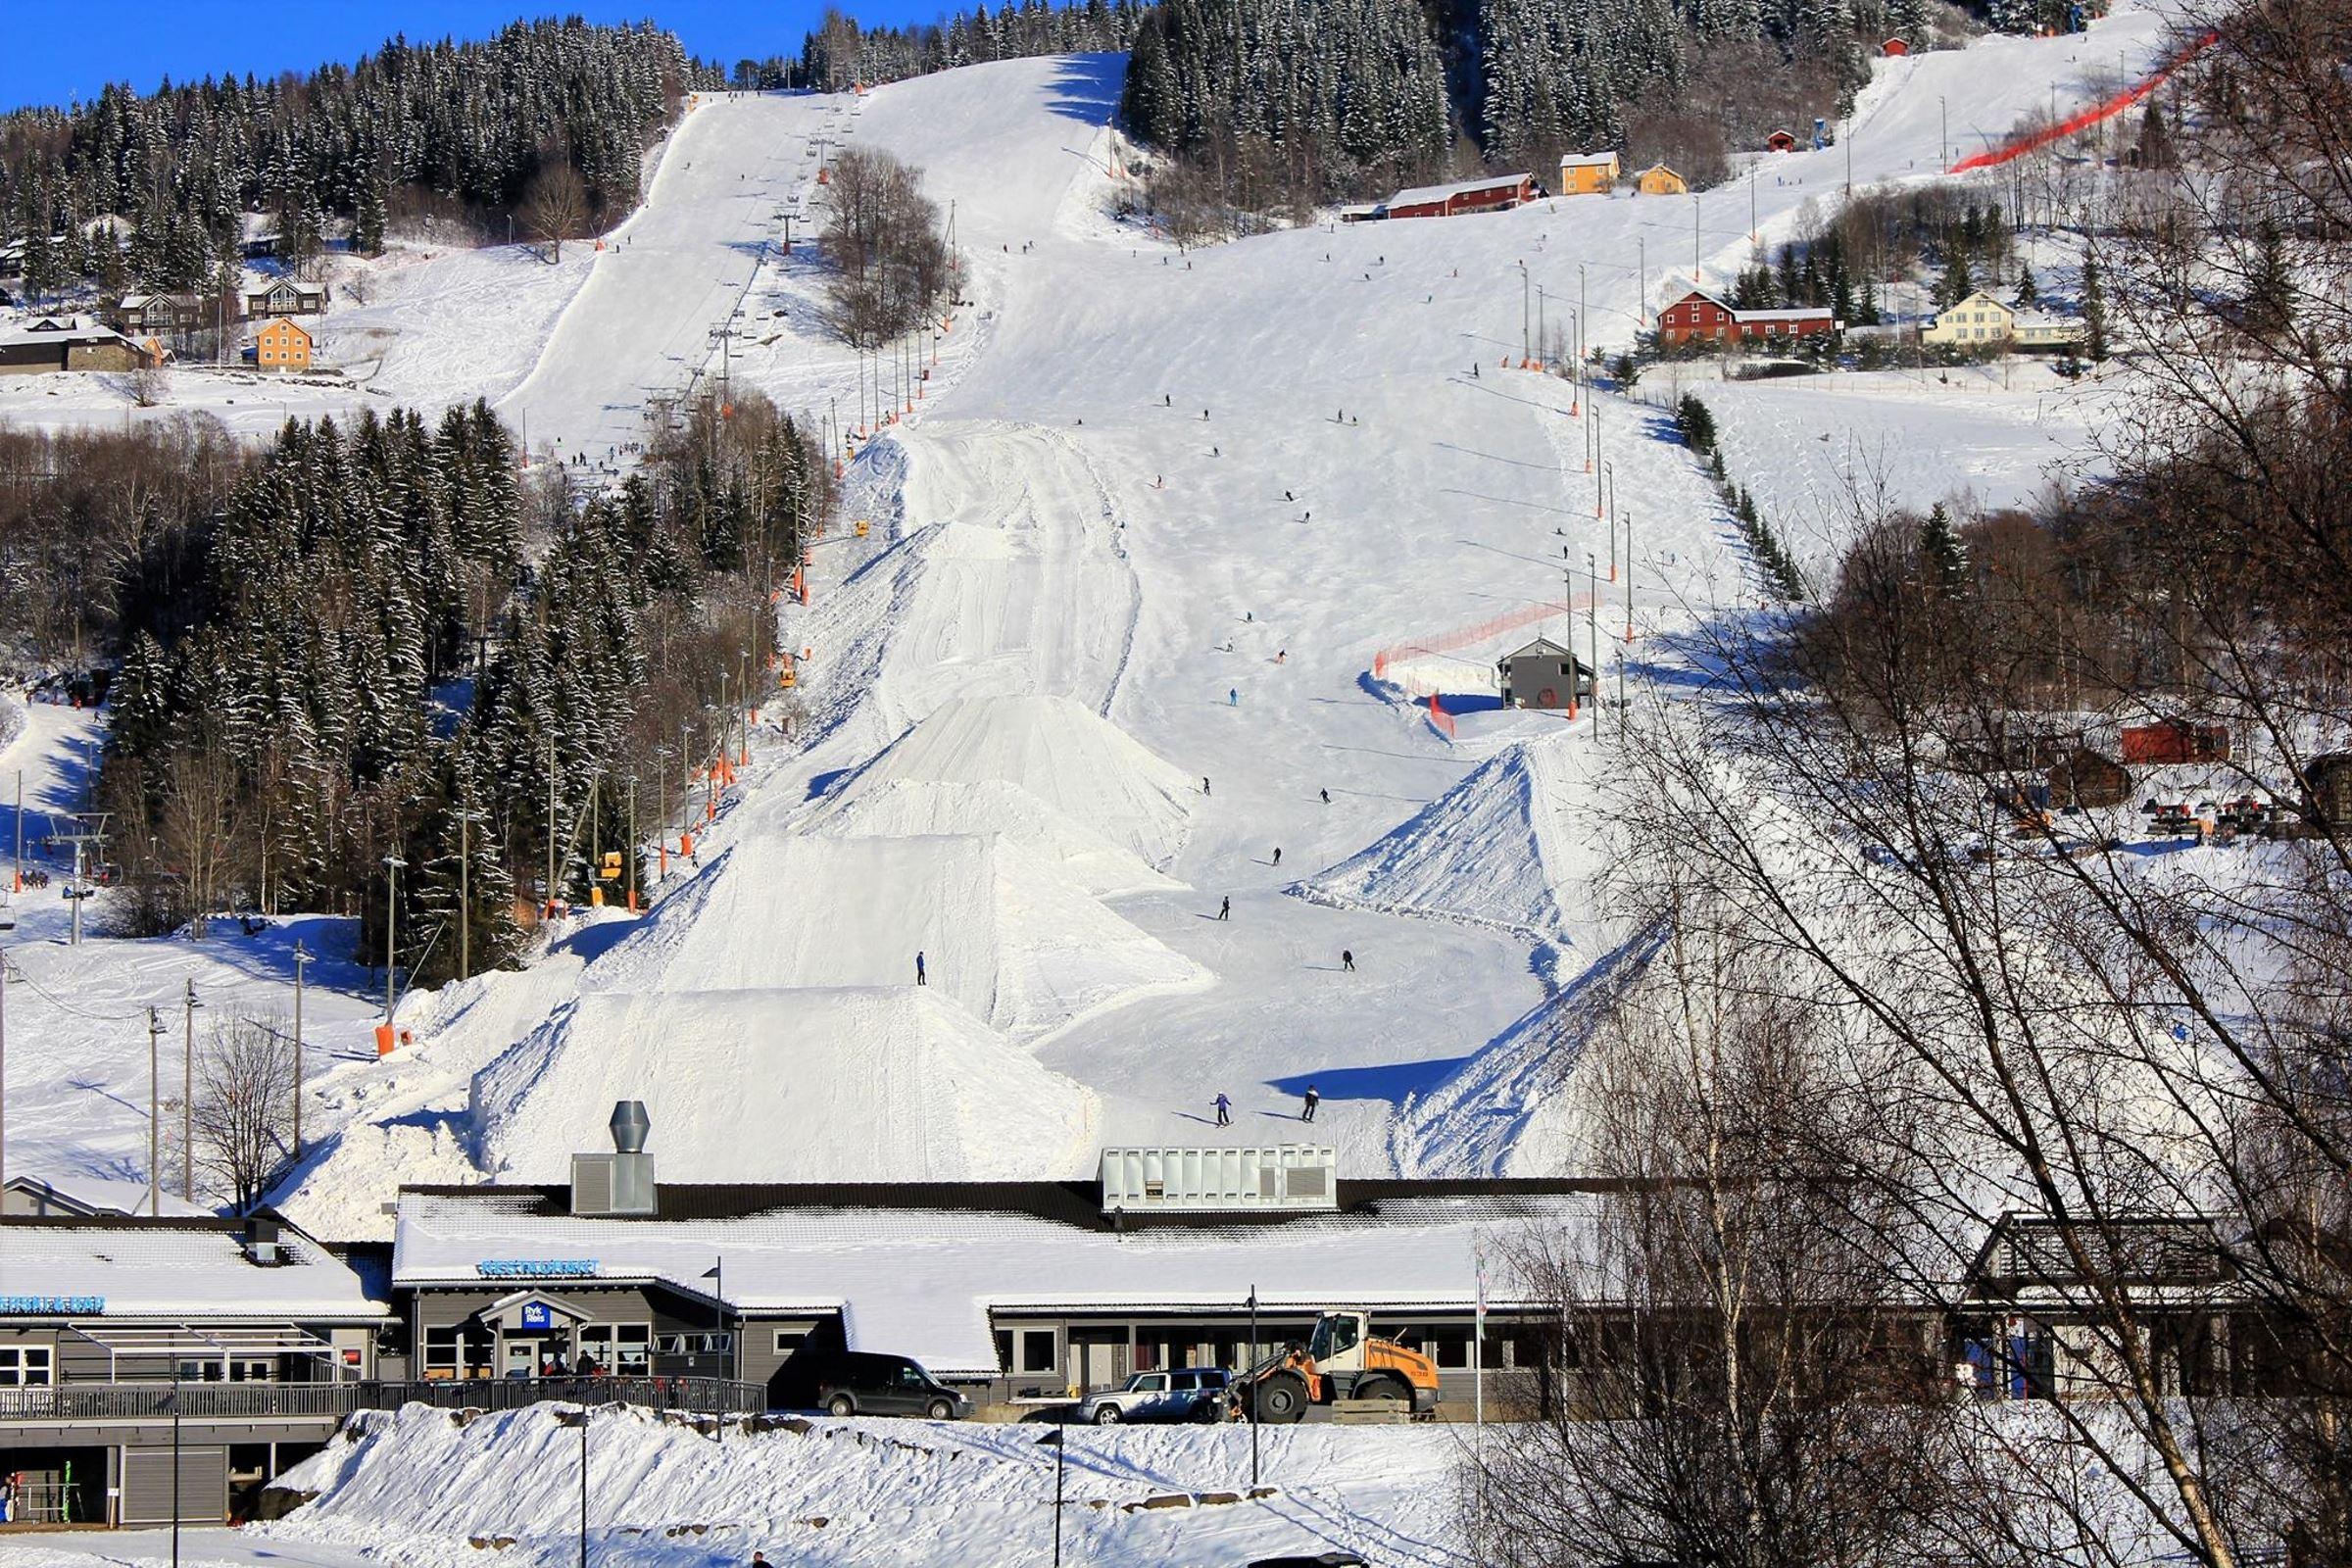 X Games Norway i Hafjell